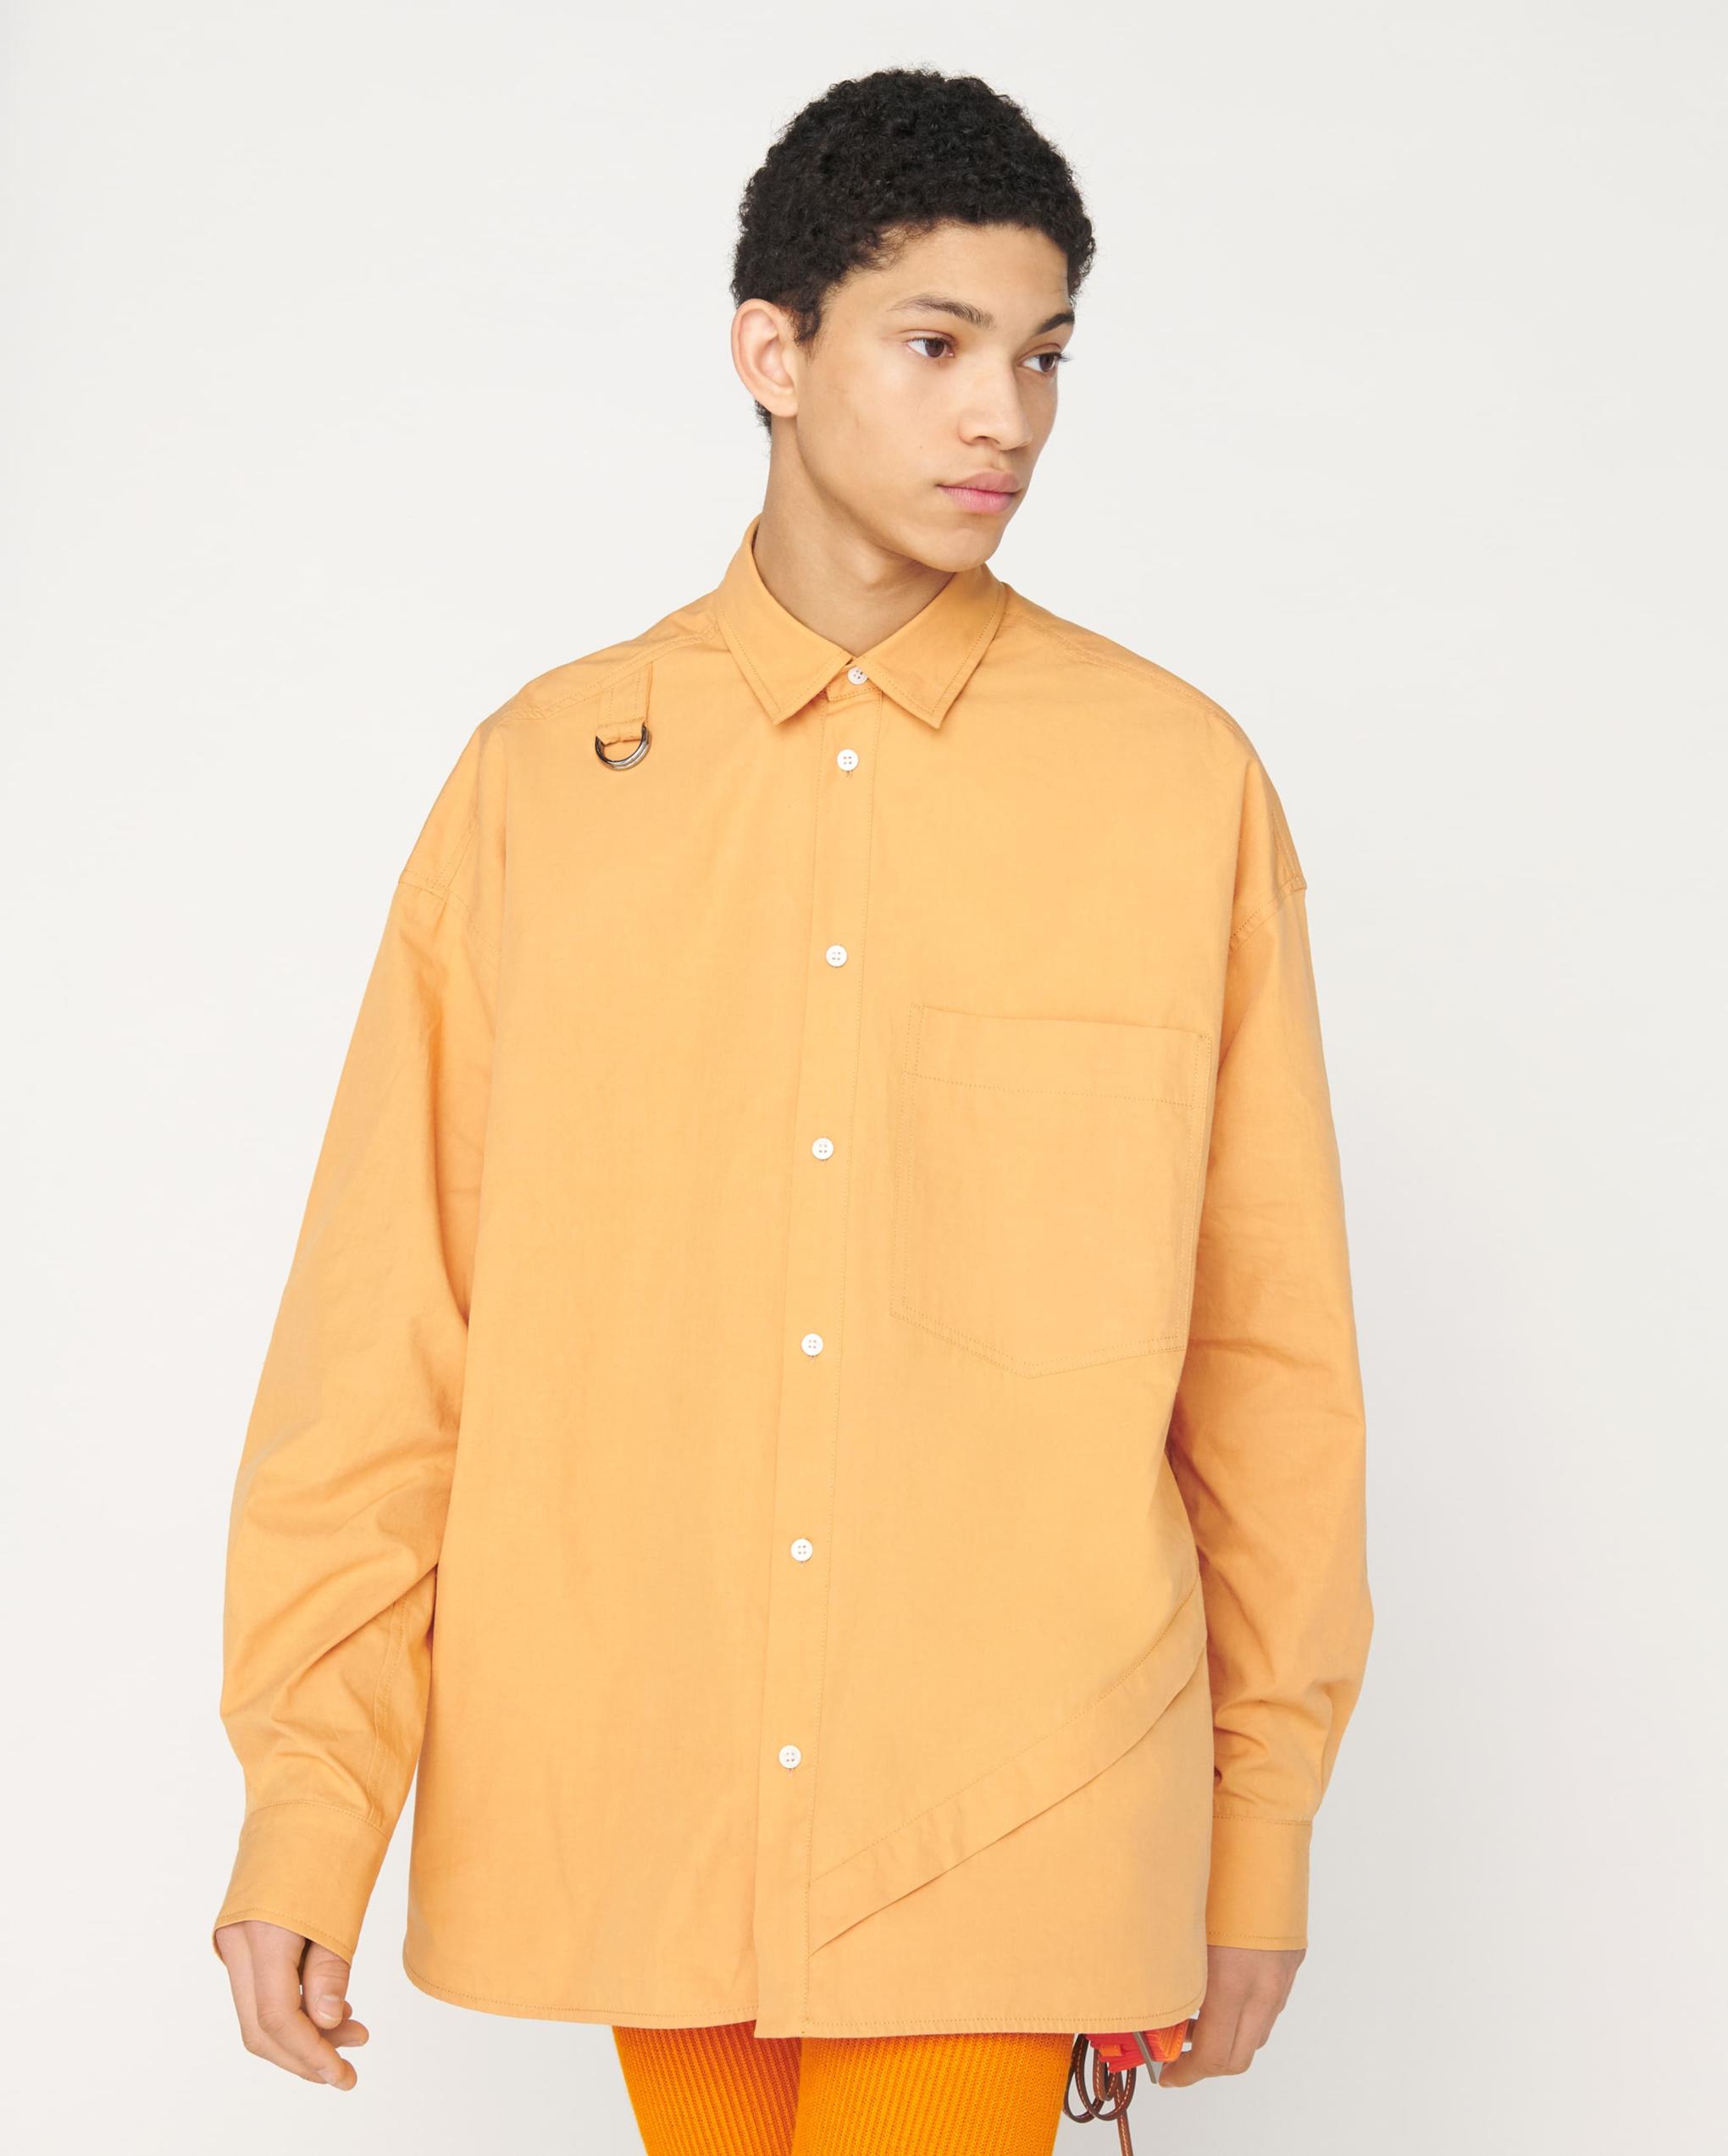 La chemise Banane